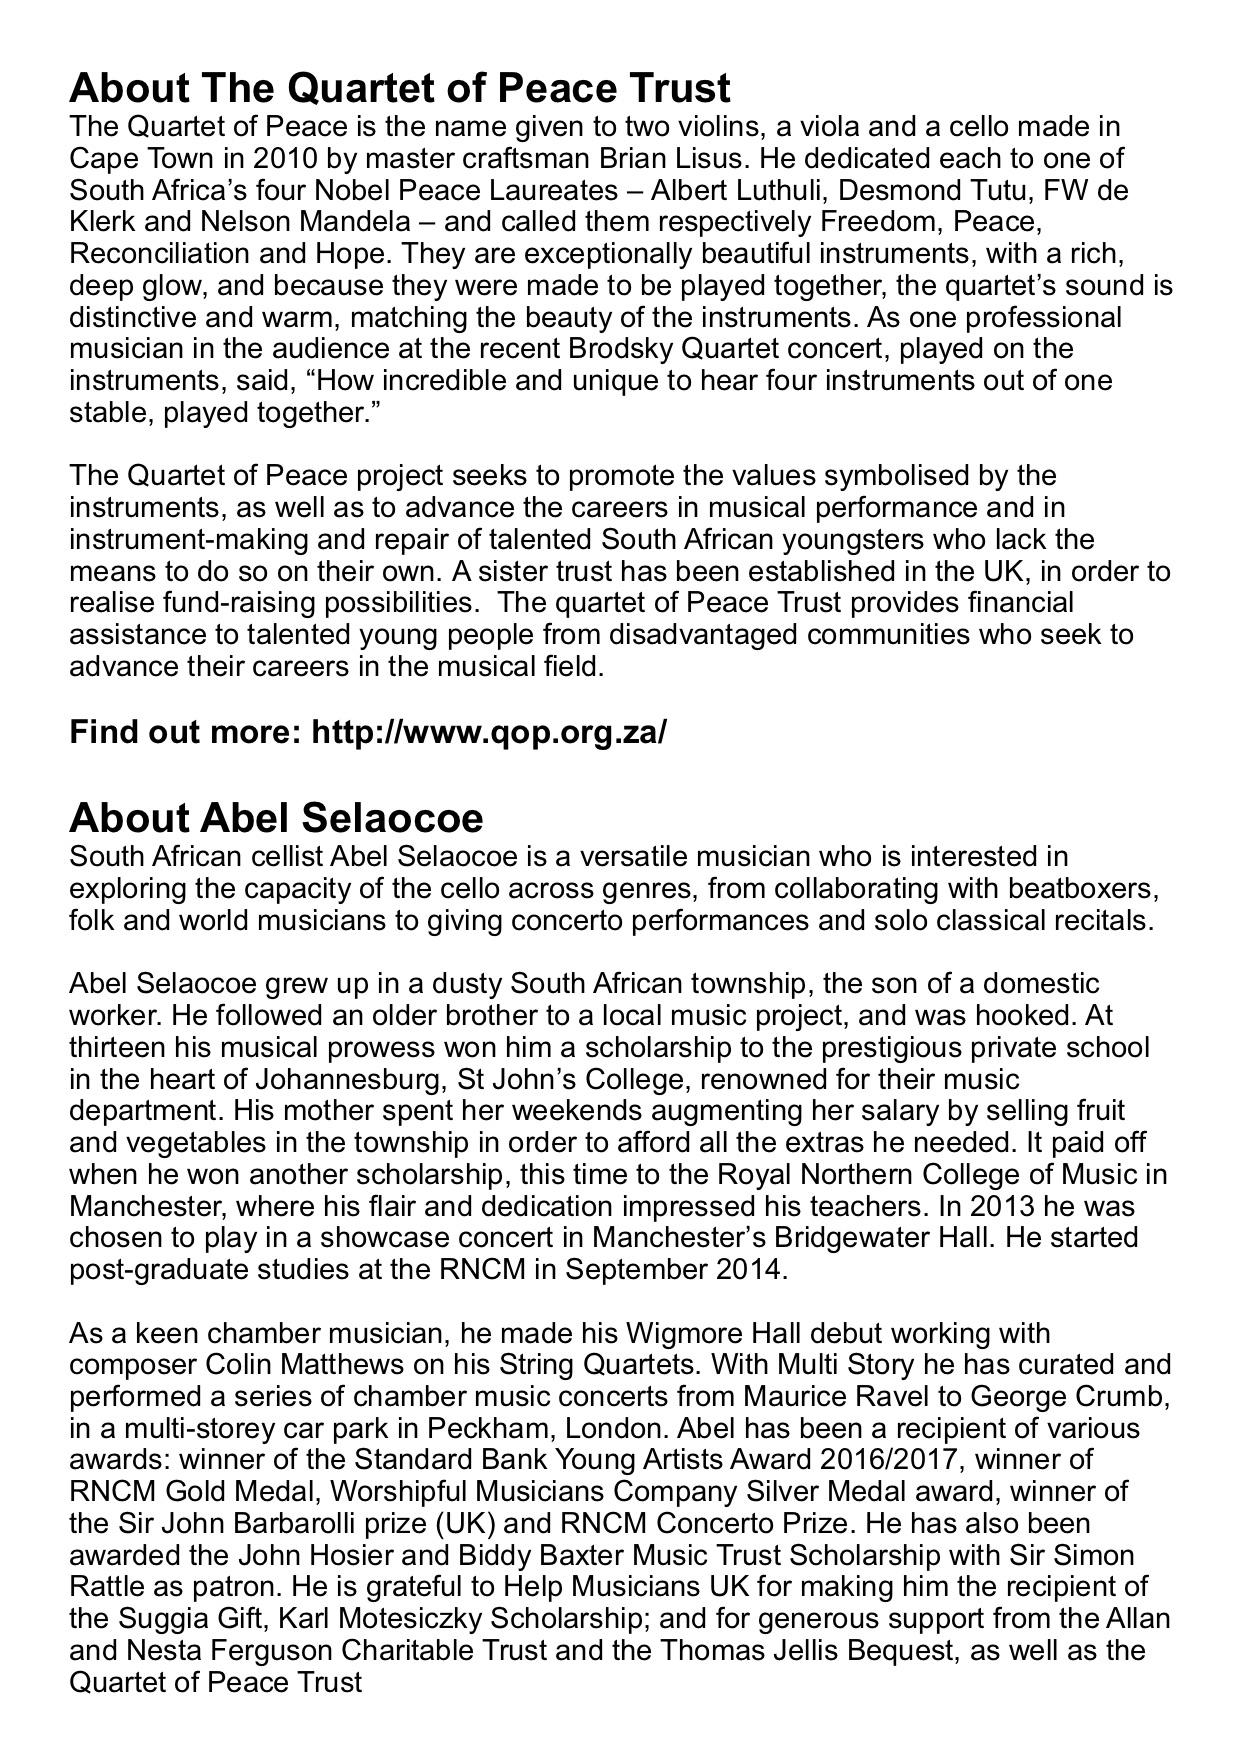 Abel Selaocoe Friday 6th July 2.jpg